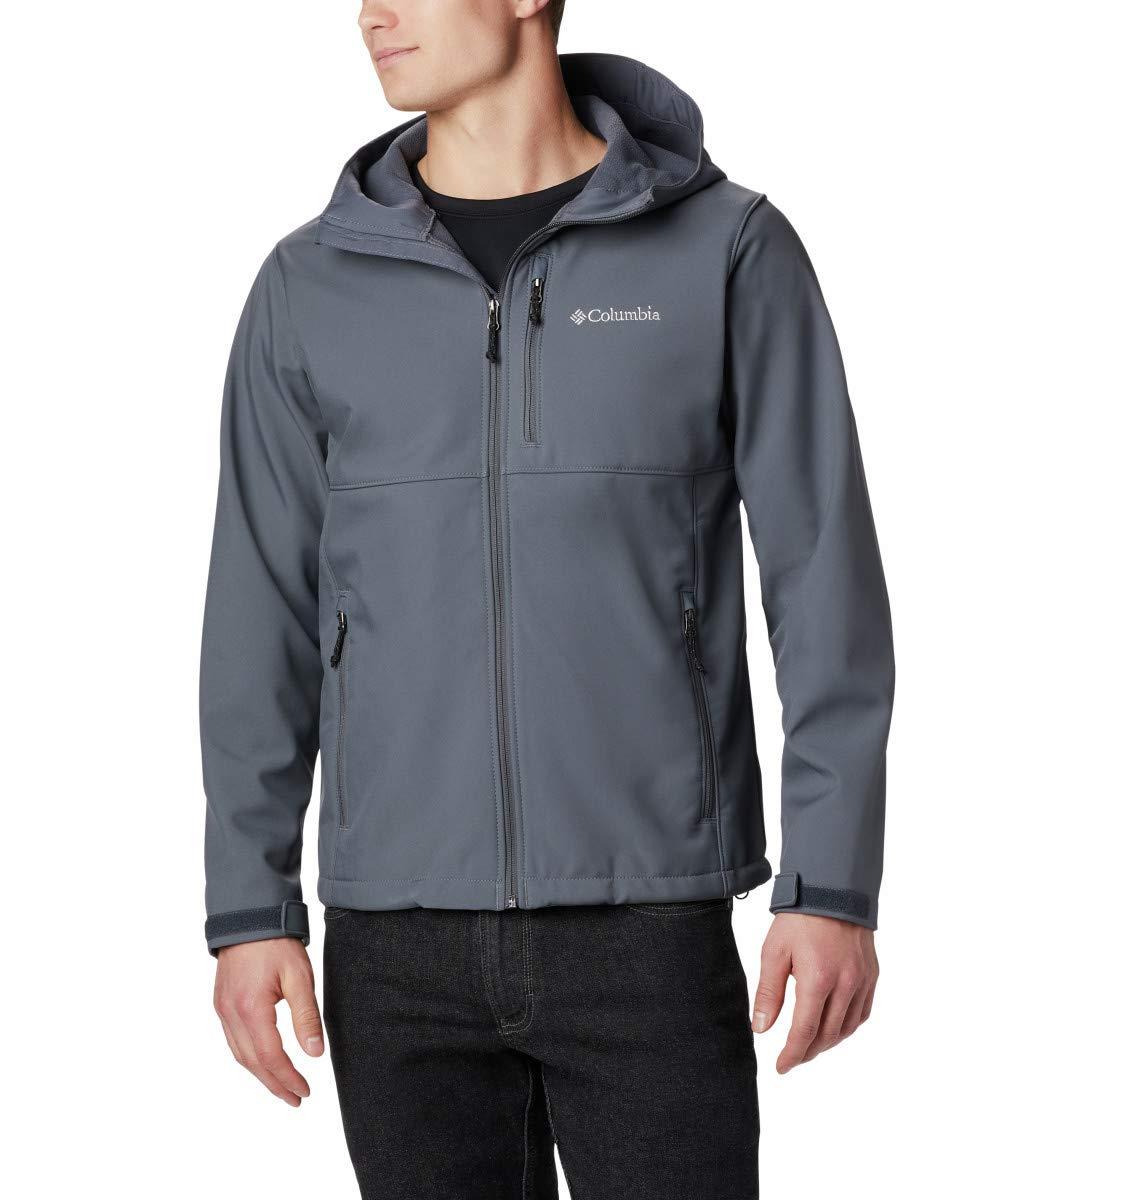 Columbia Men's Ascender Hooded Softshell Jacket, Graphite, Large